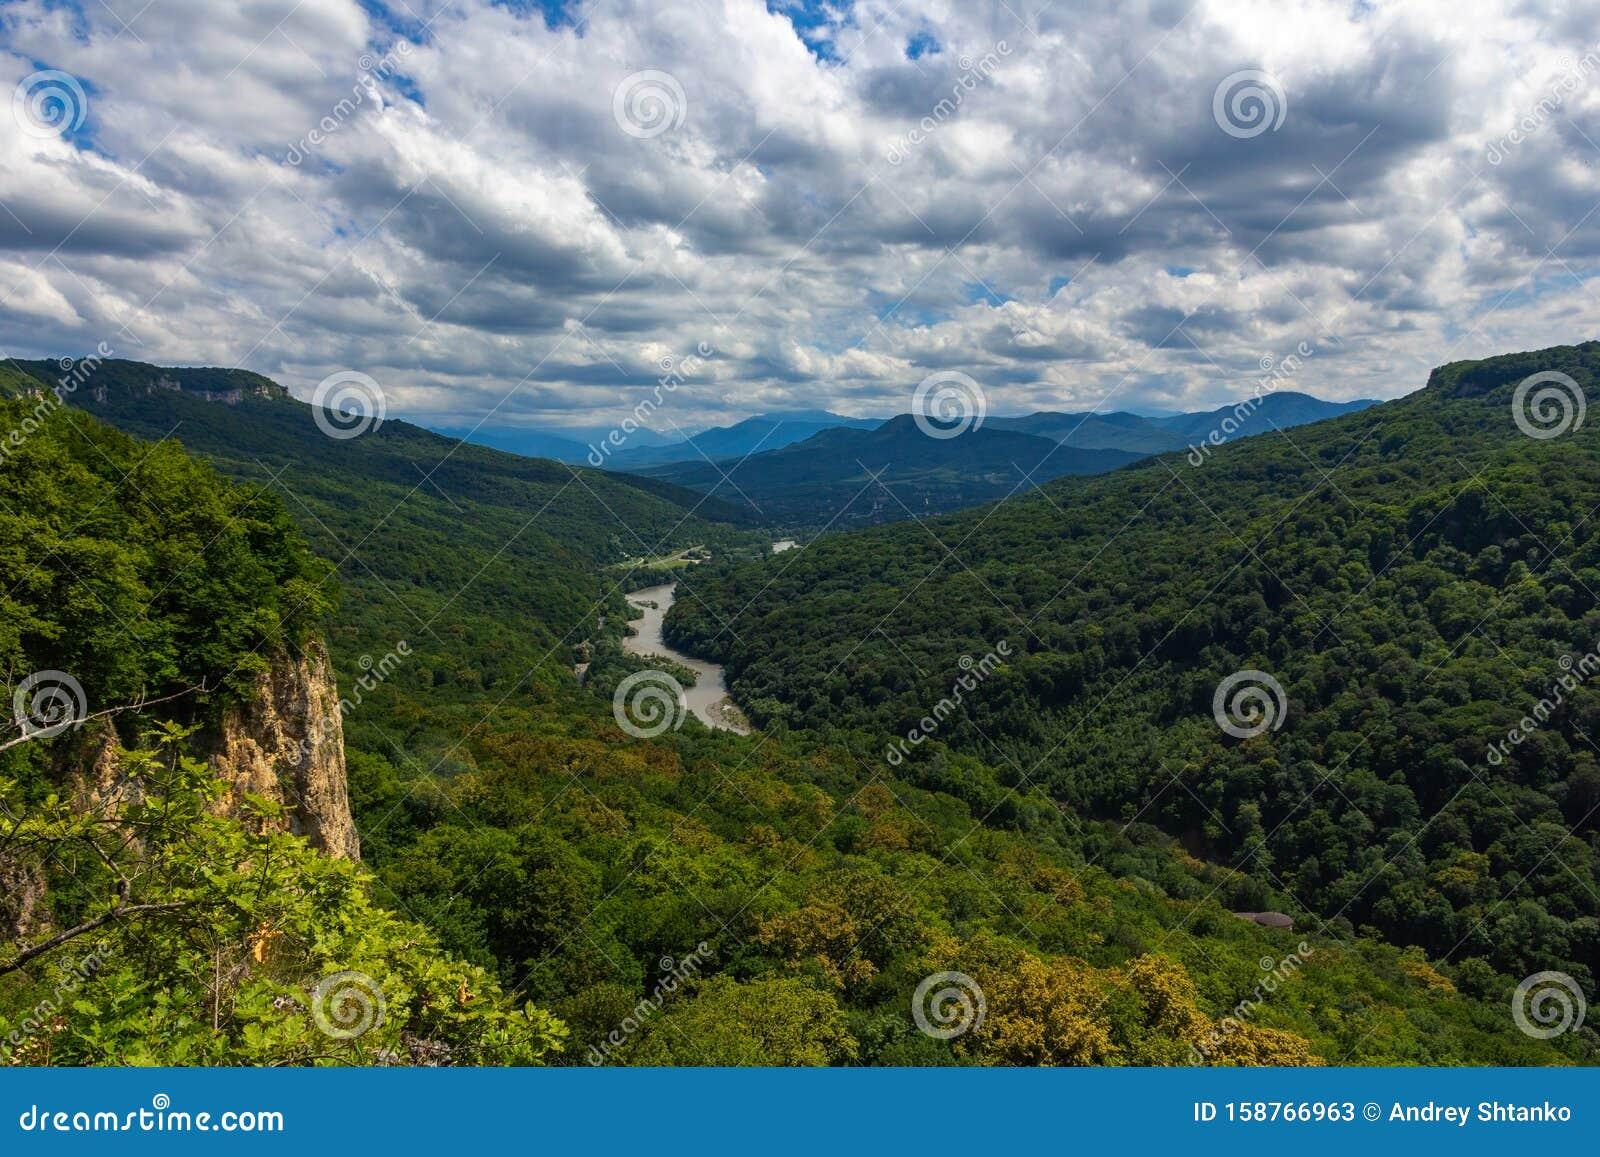 Adygea Mountains stock image. Image of adygea, forest - 158766963